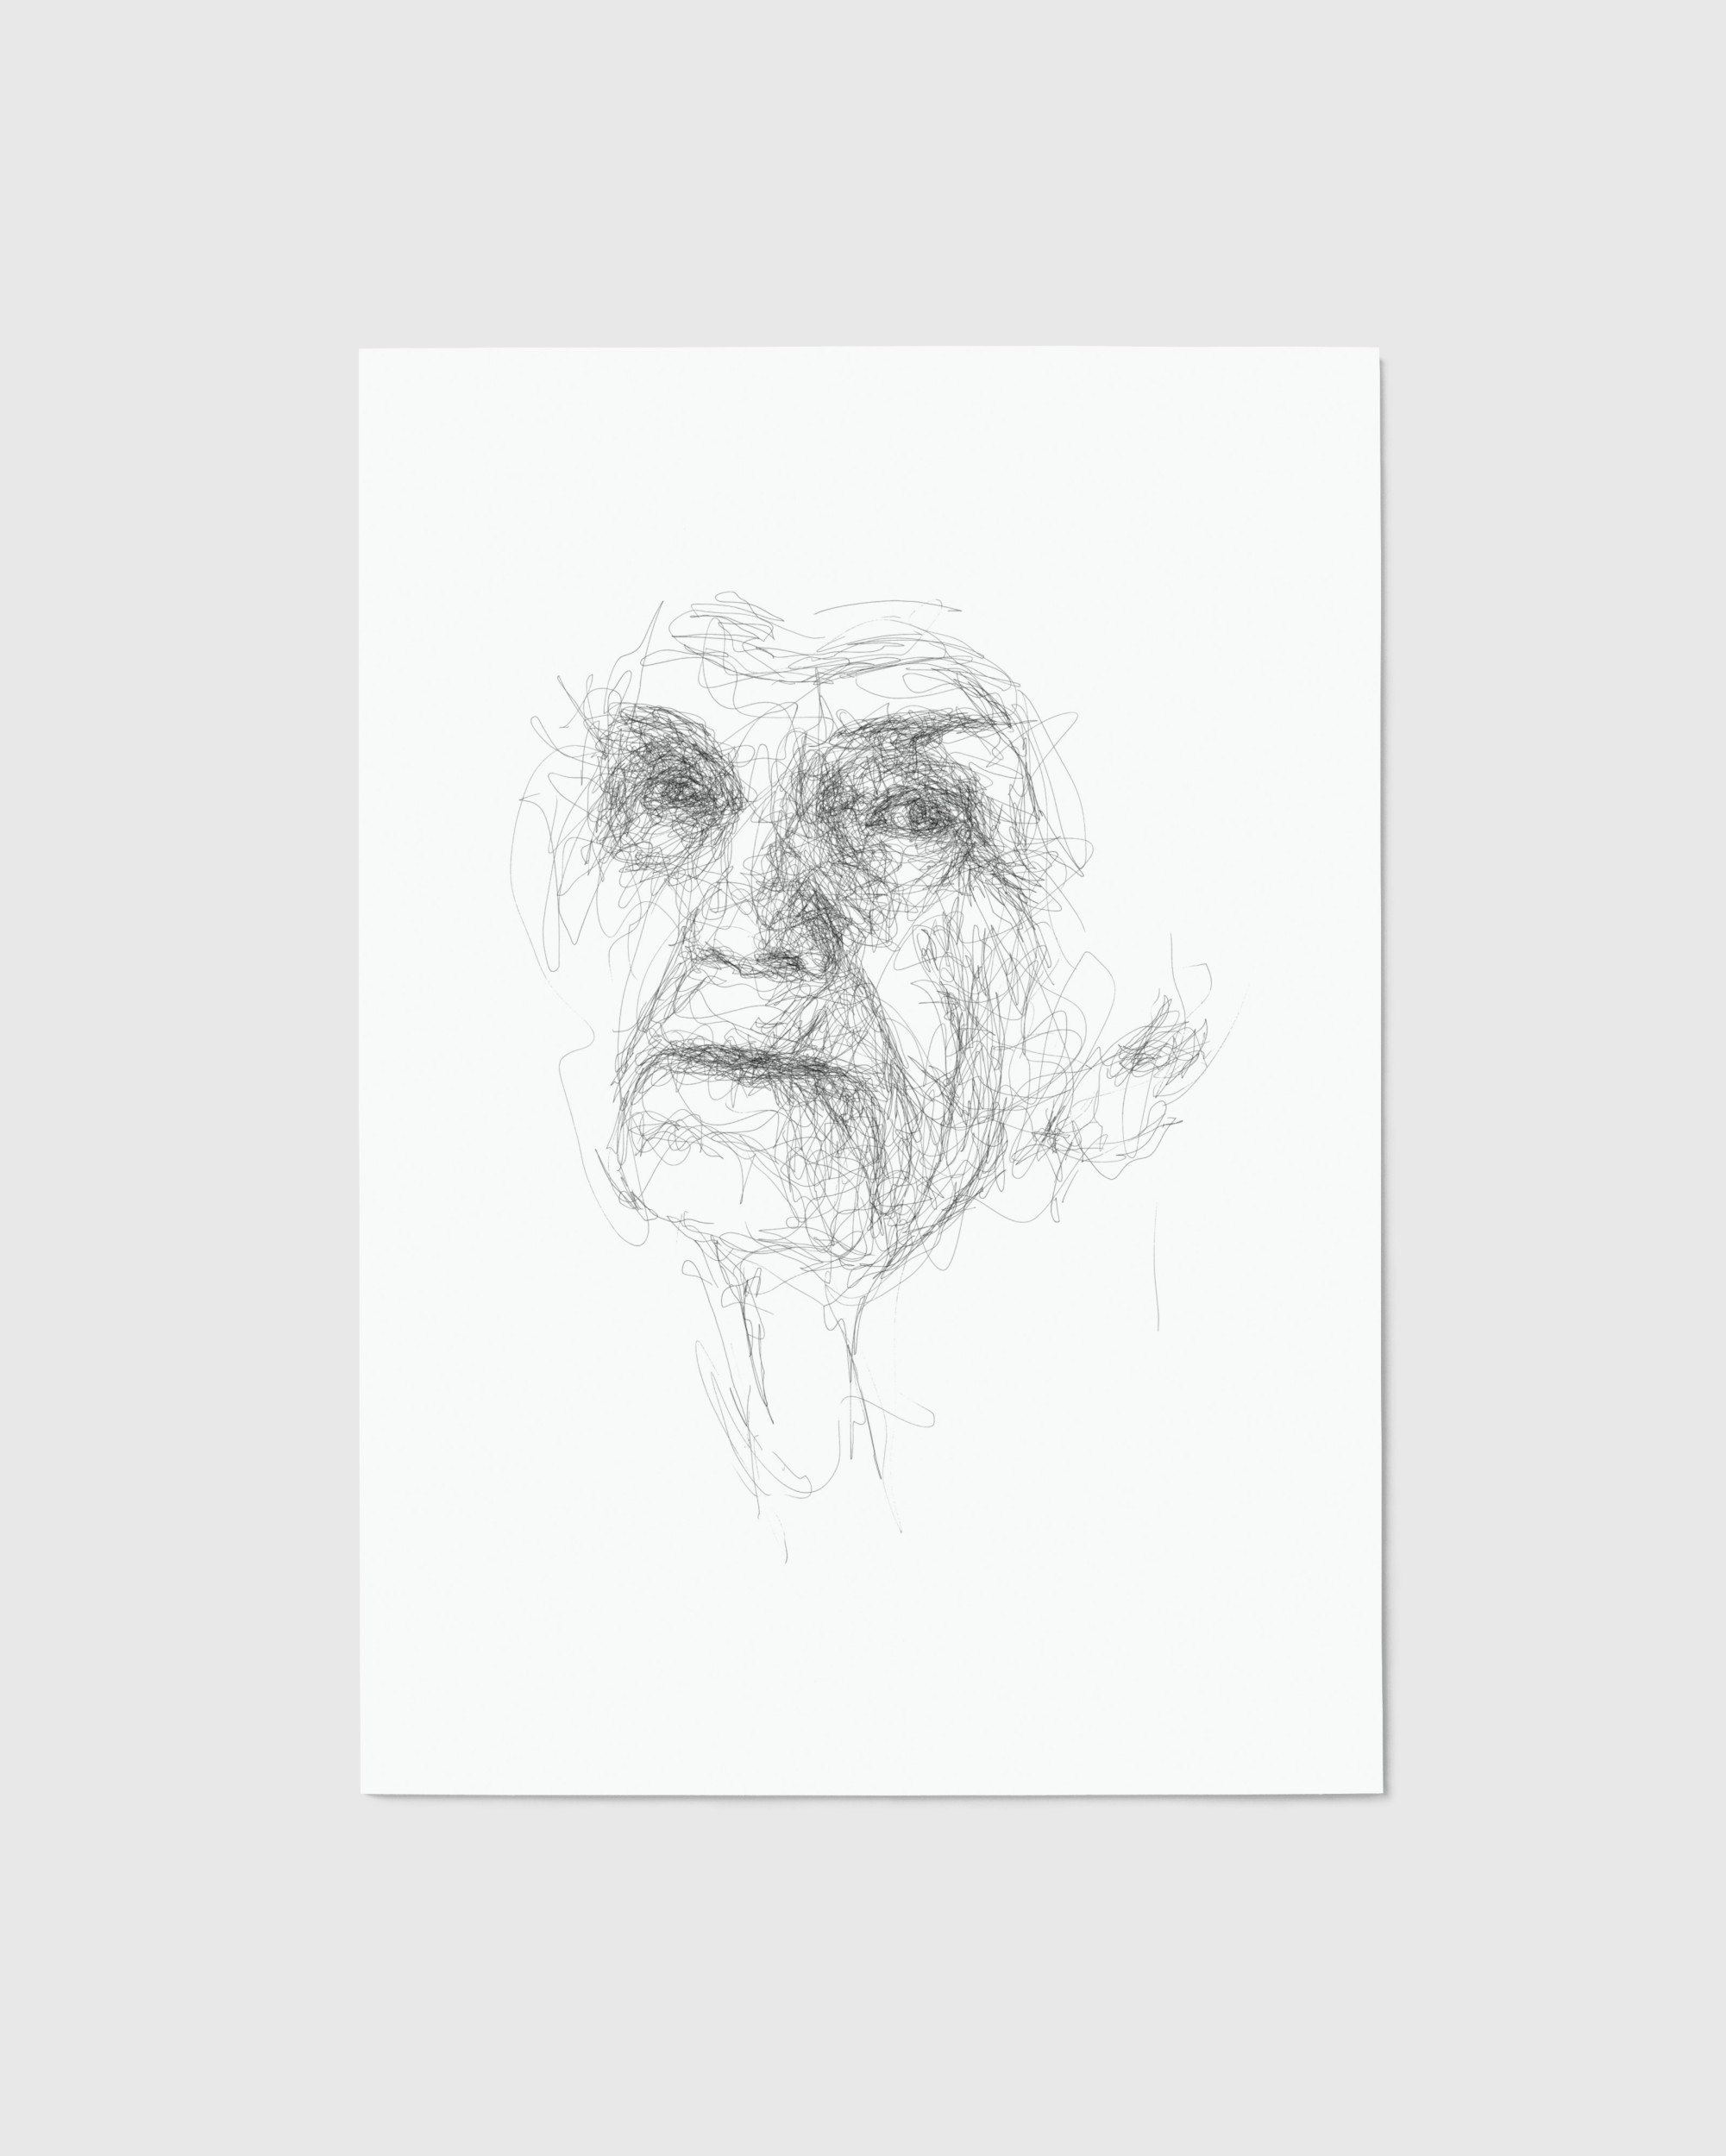 Scribble Face #29